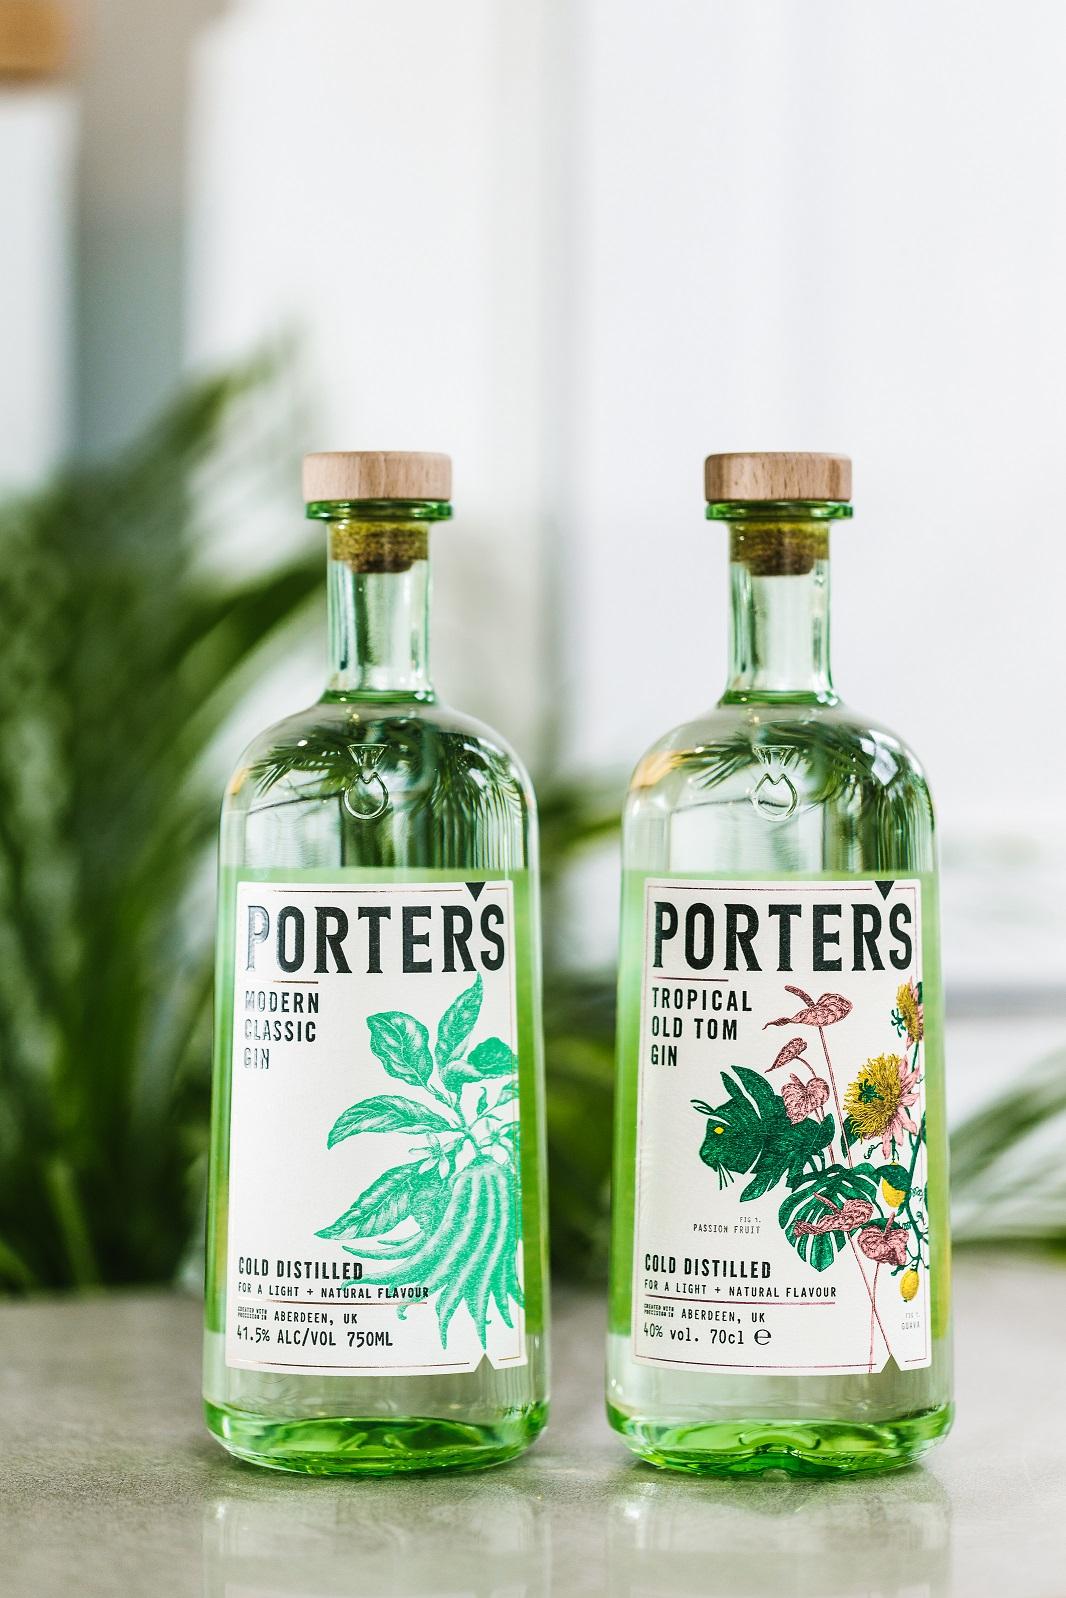 158 - Porters - April 2019 - Fullsize - Grant Anderson.jpg